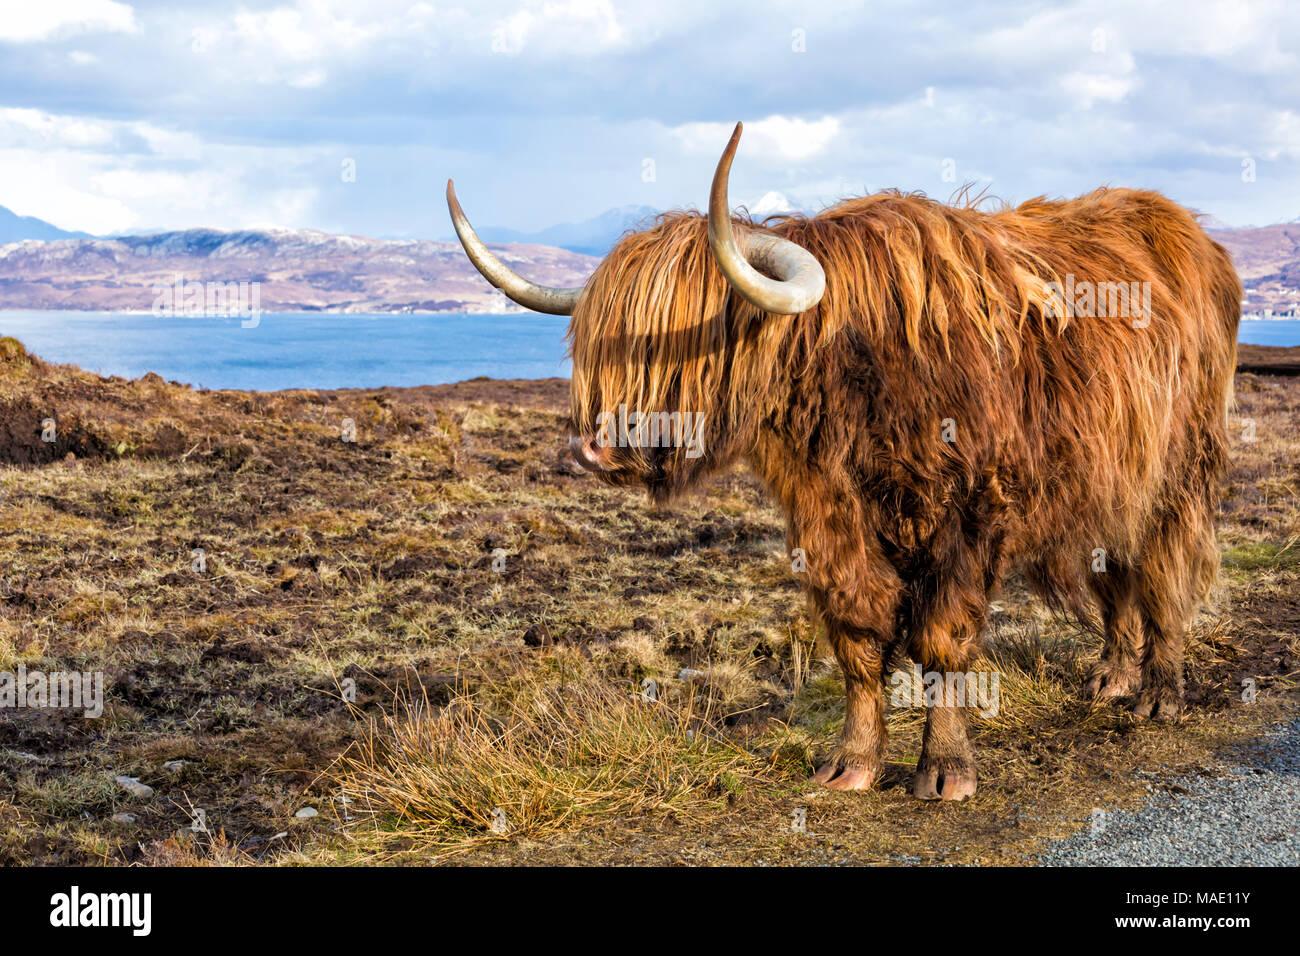 Highland cattle cow in landscape on Isle of Skye near Elgol, Scotland, UK in March - Stock Image